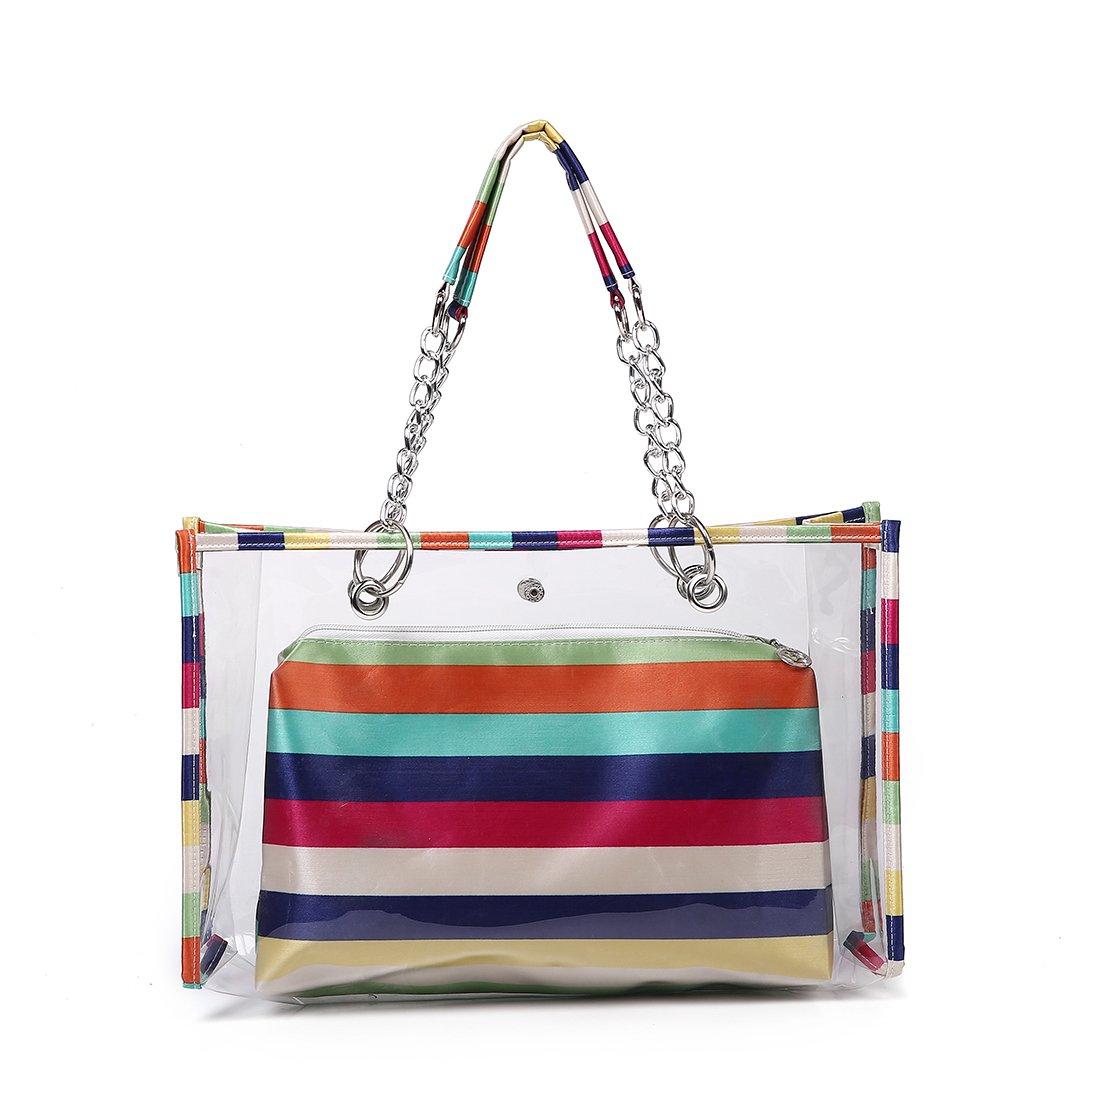 Fancy Love Large Capacity Clear Shoulder Bag Transparent Handbags PVC Beach Package Tote Bags Women